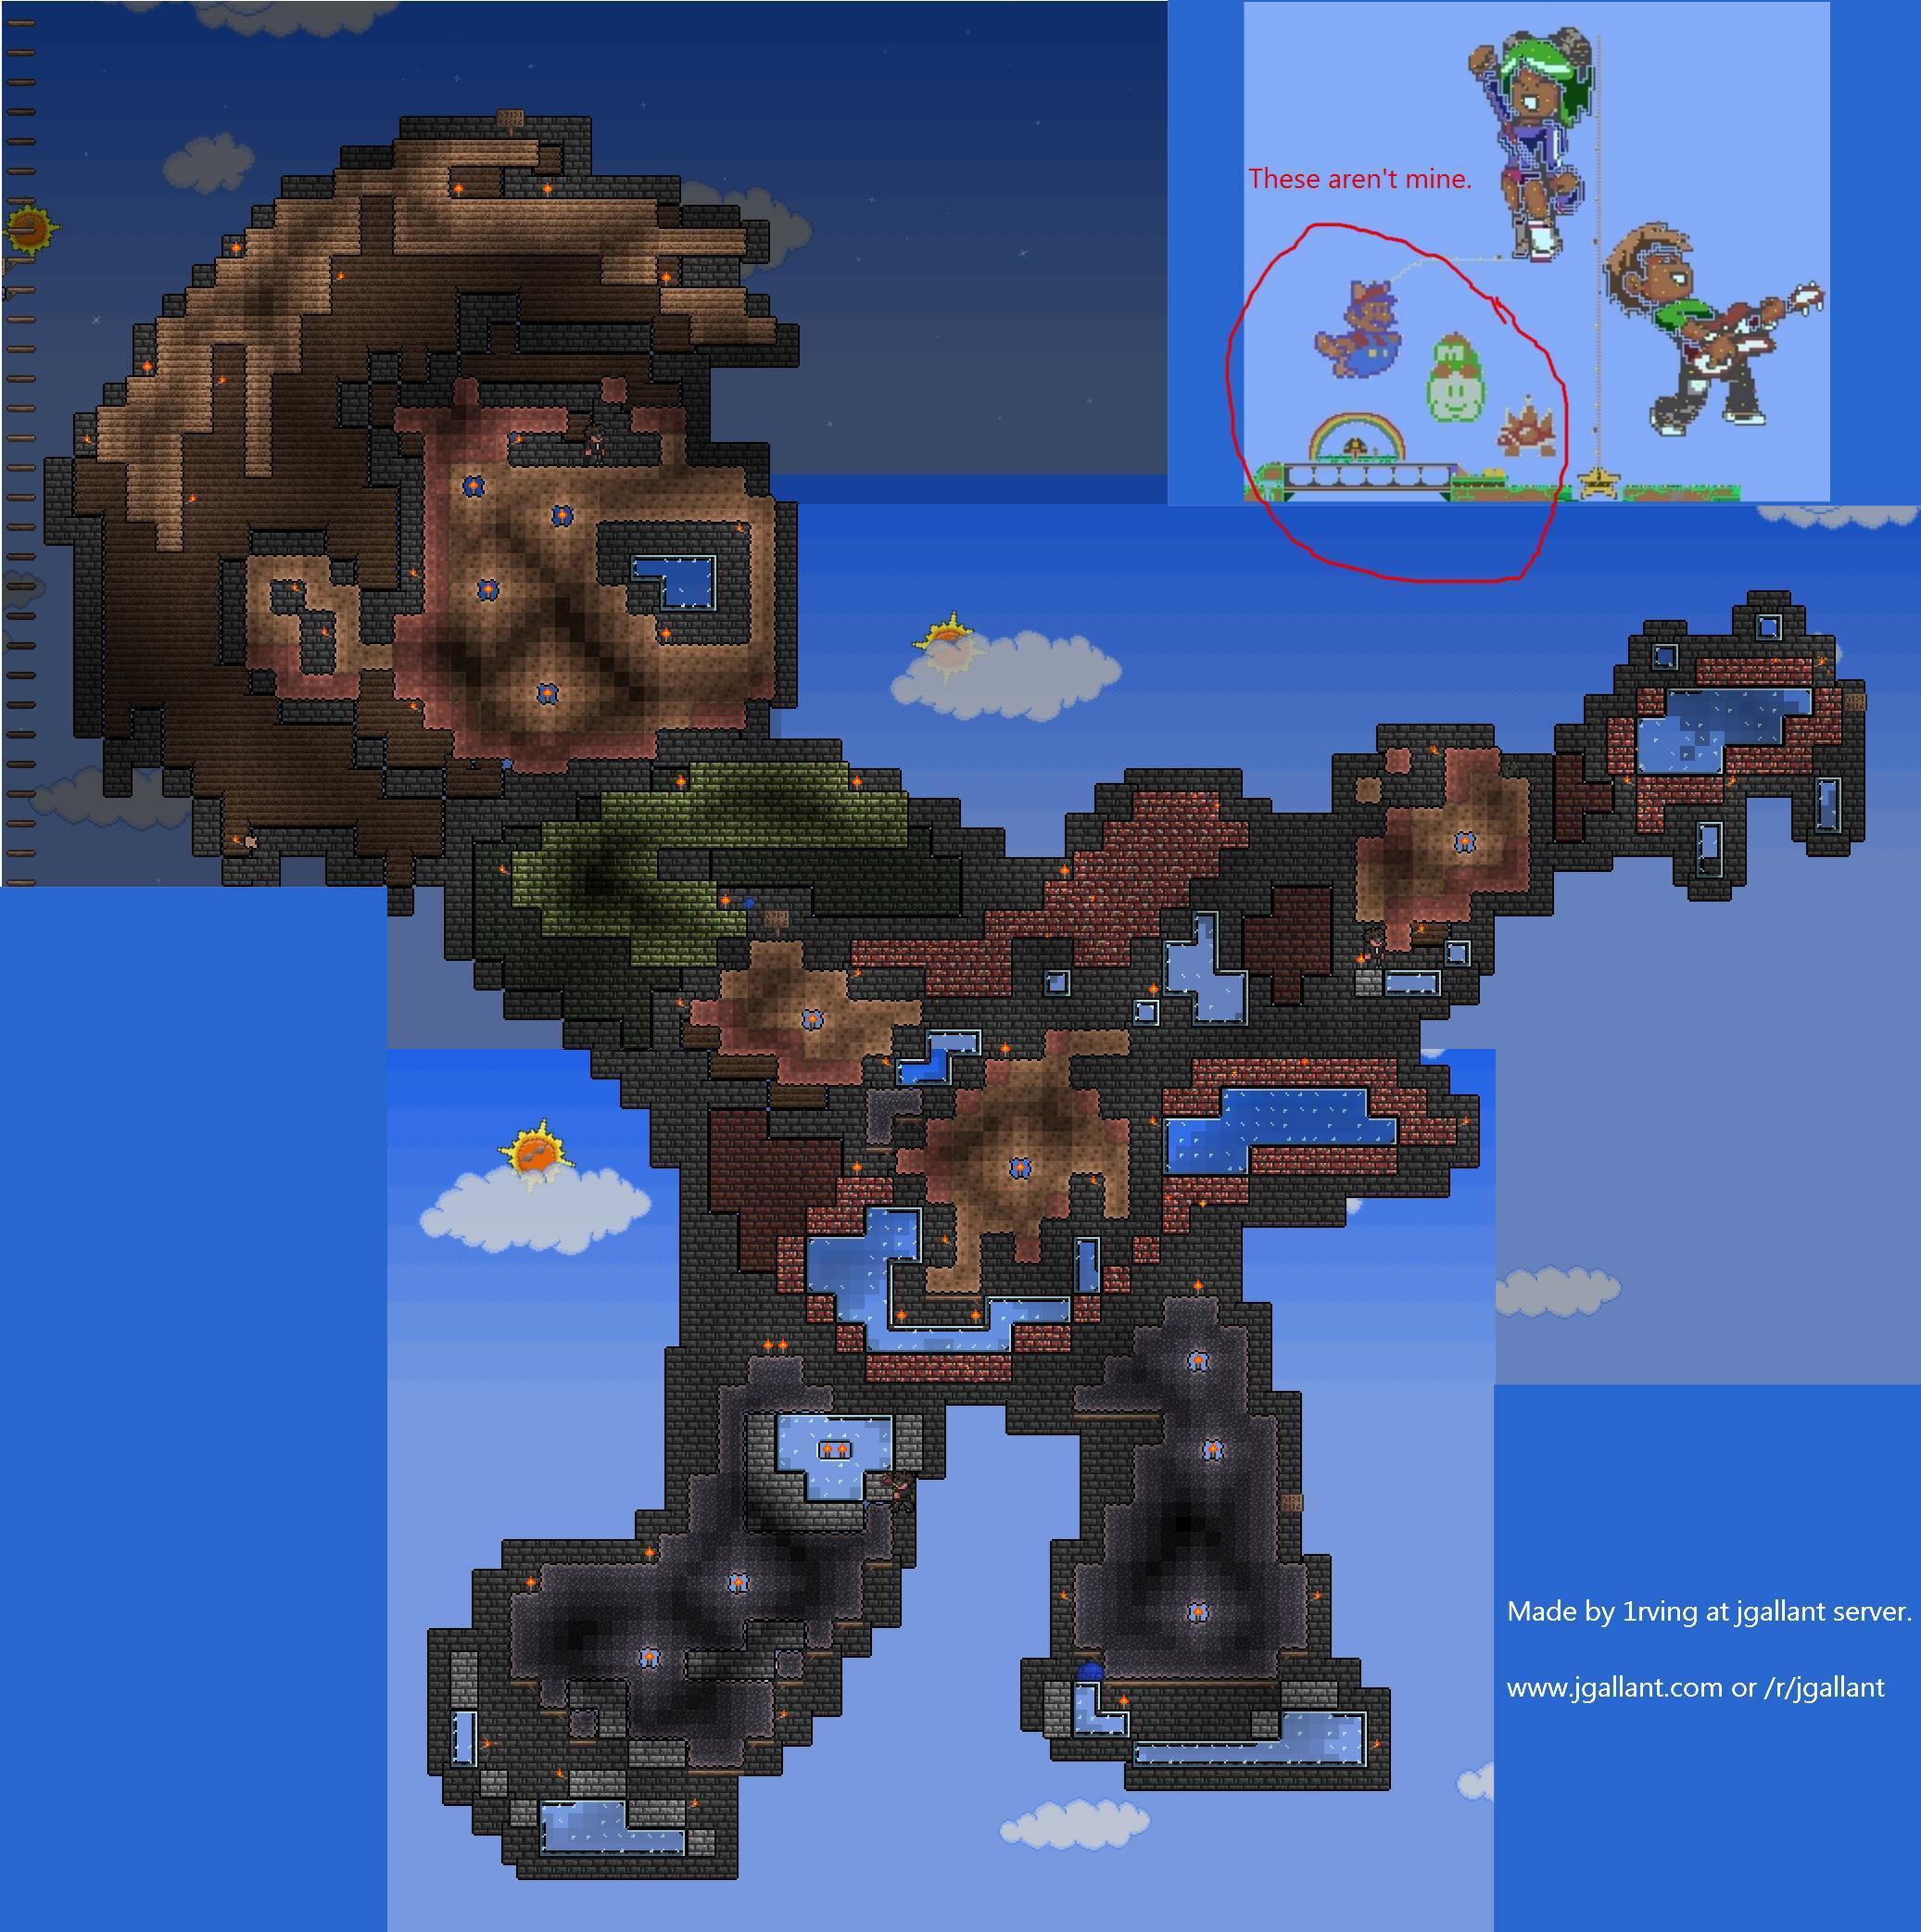 Scott Pilgrim Pixel Art By 1rving Terraria Know Your Meme